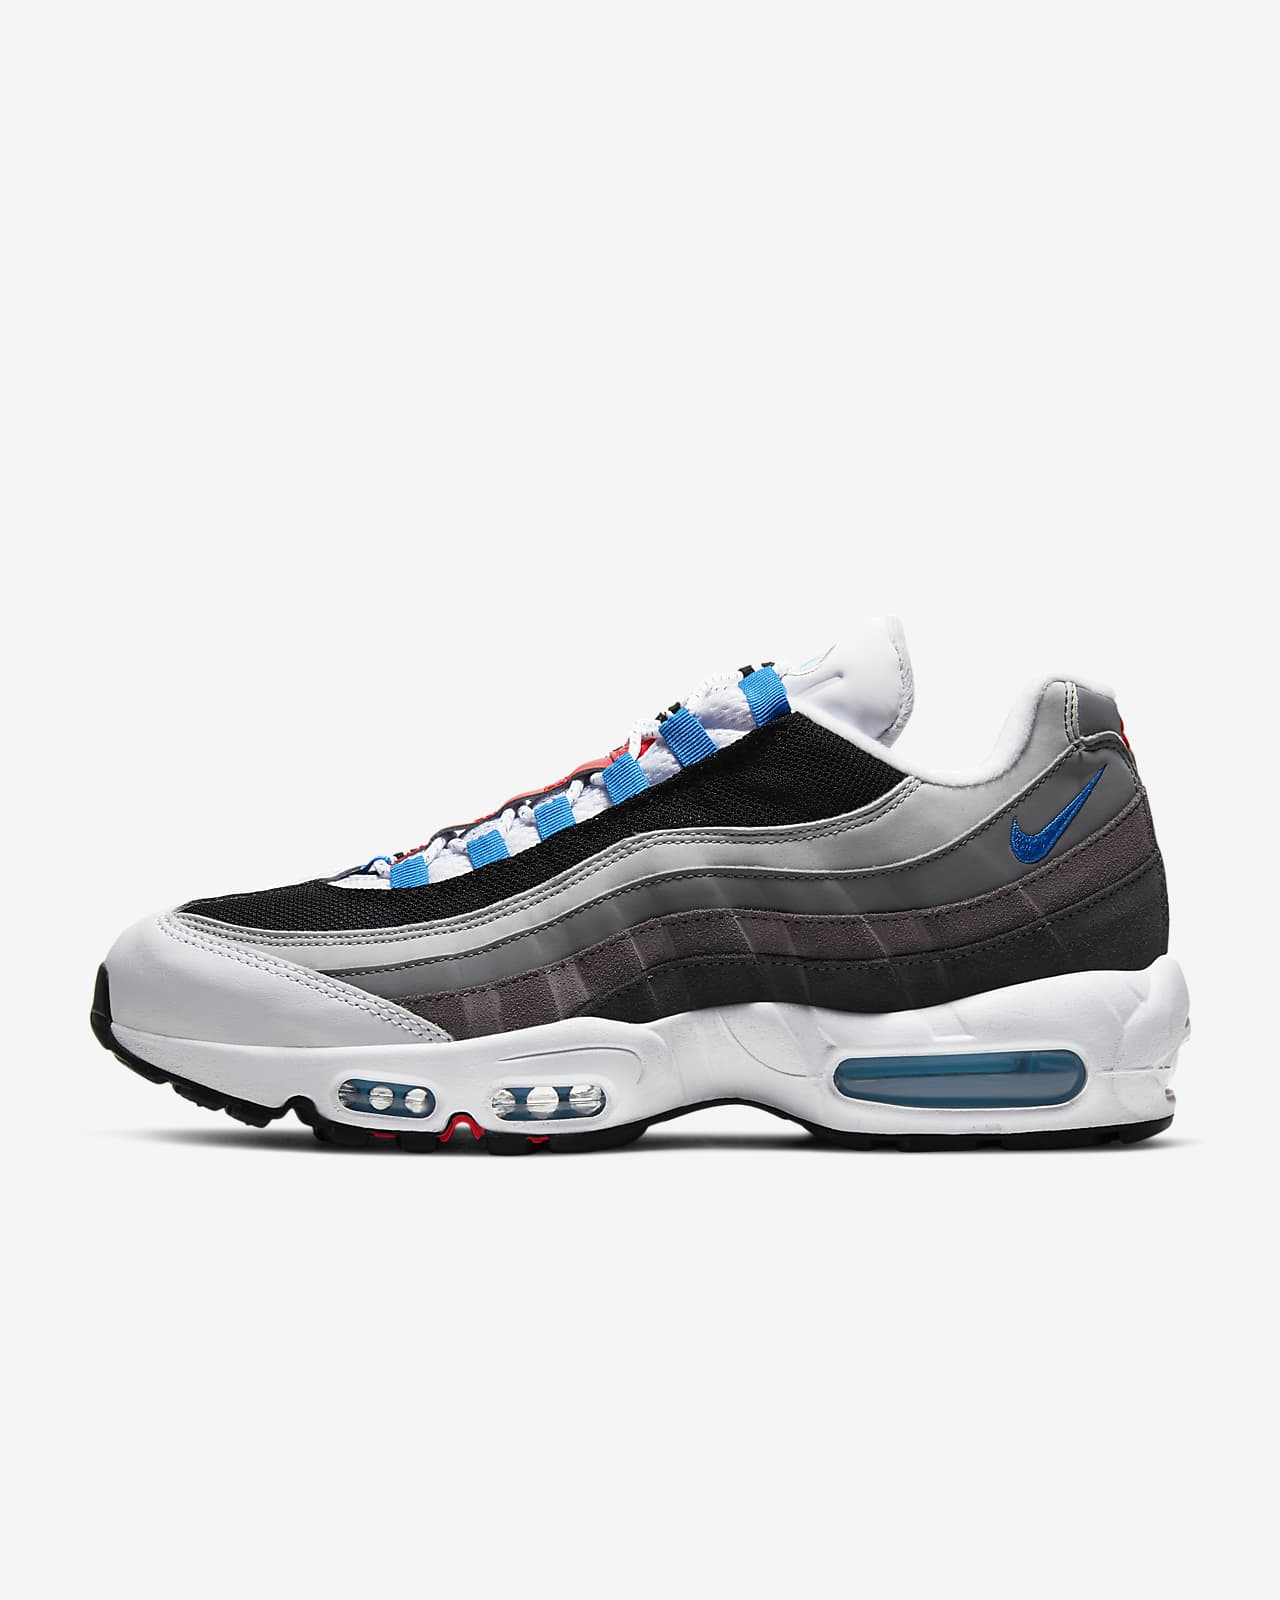 Nike Air Max 95 QS 男子运动鞋